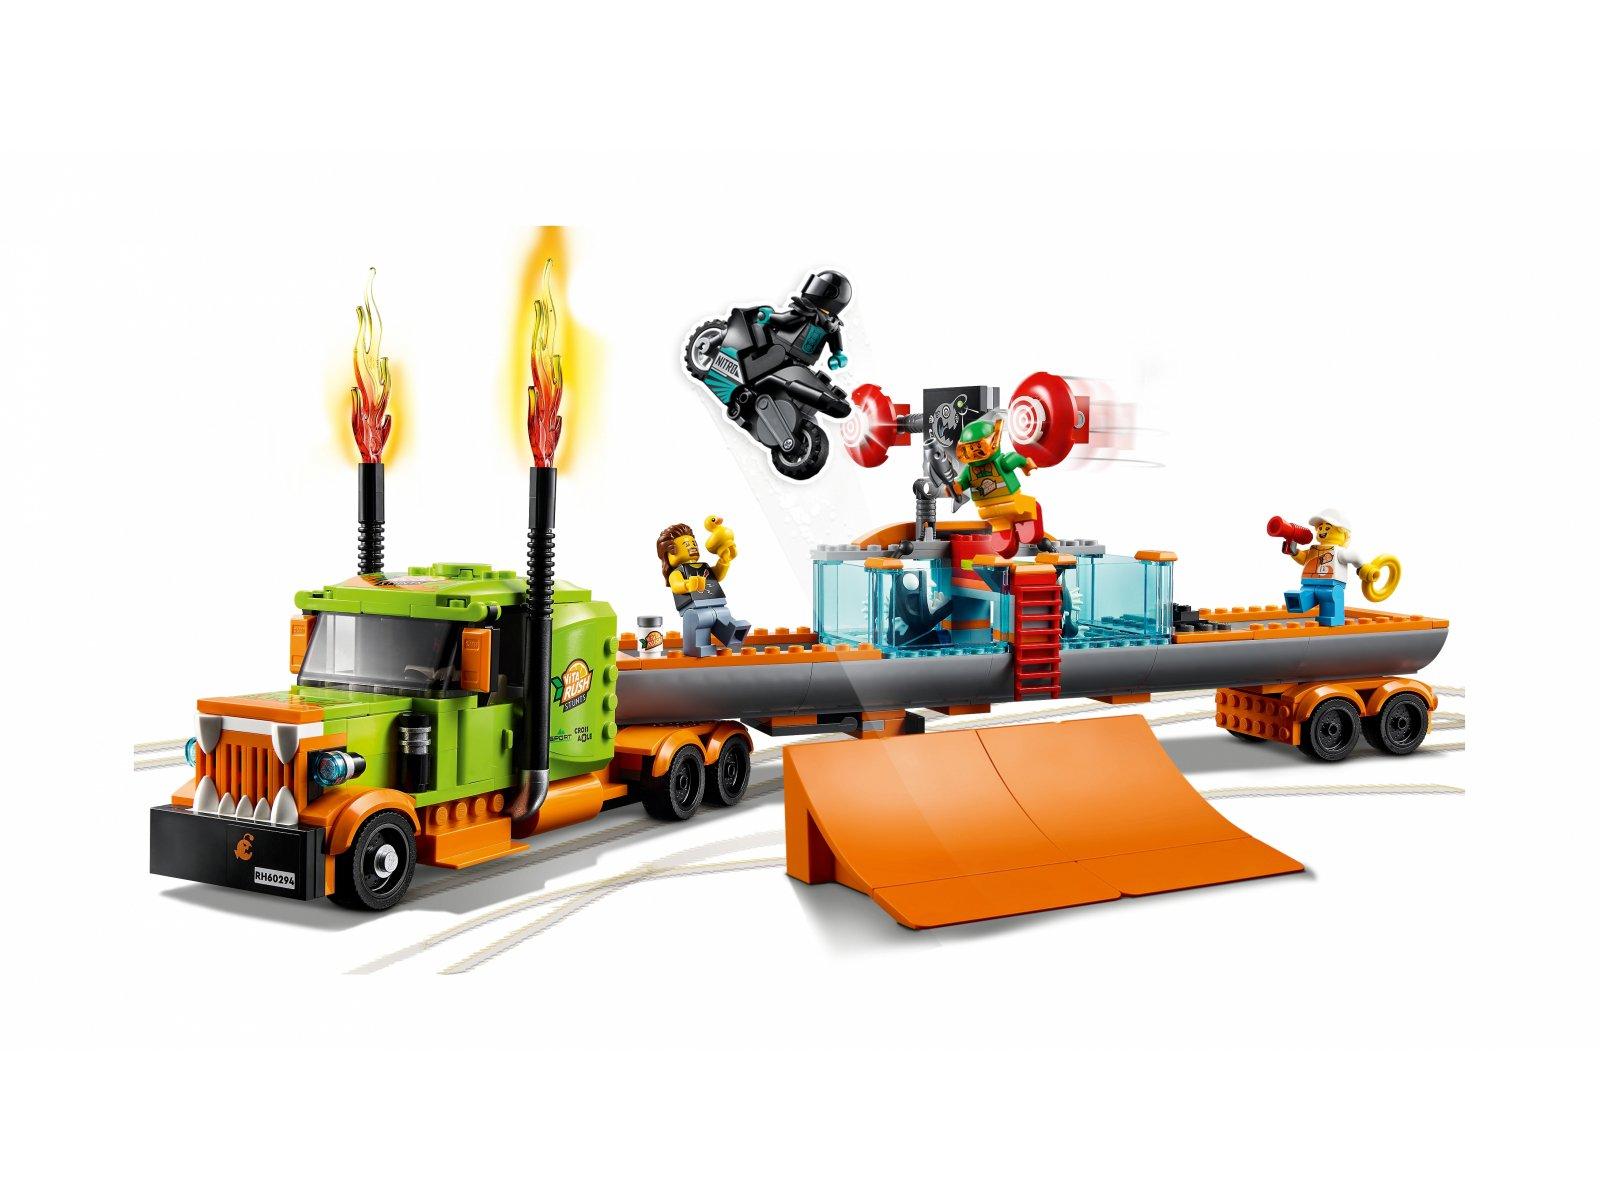 LEGO 60294 Ciężarówka kaskaderska